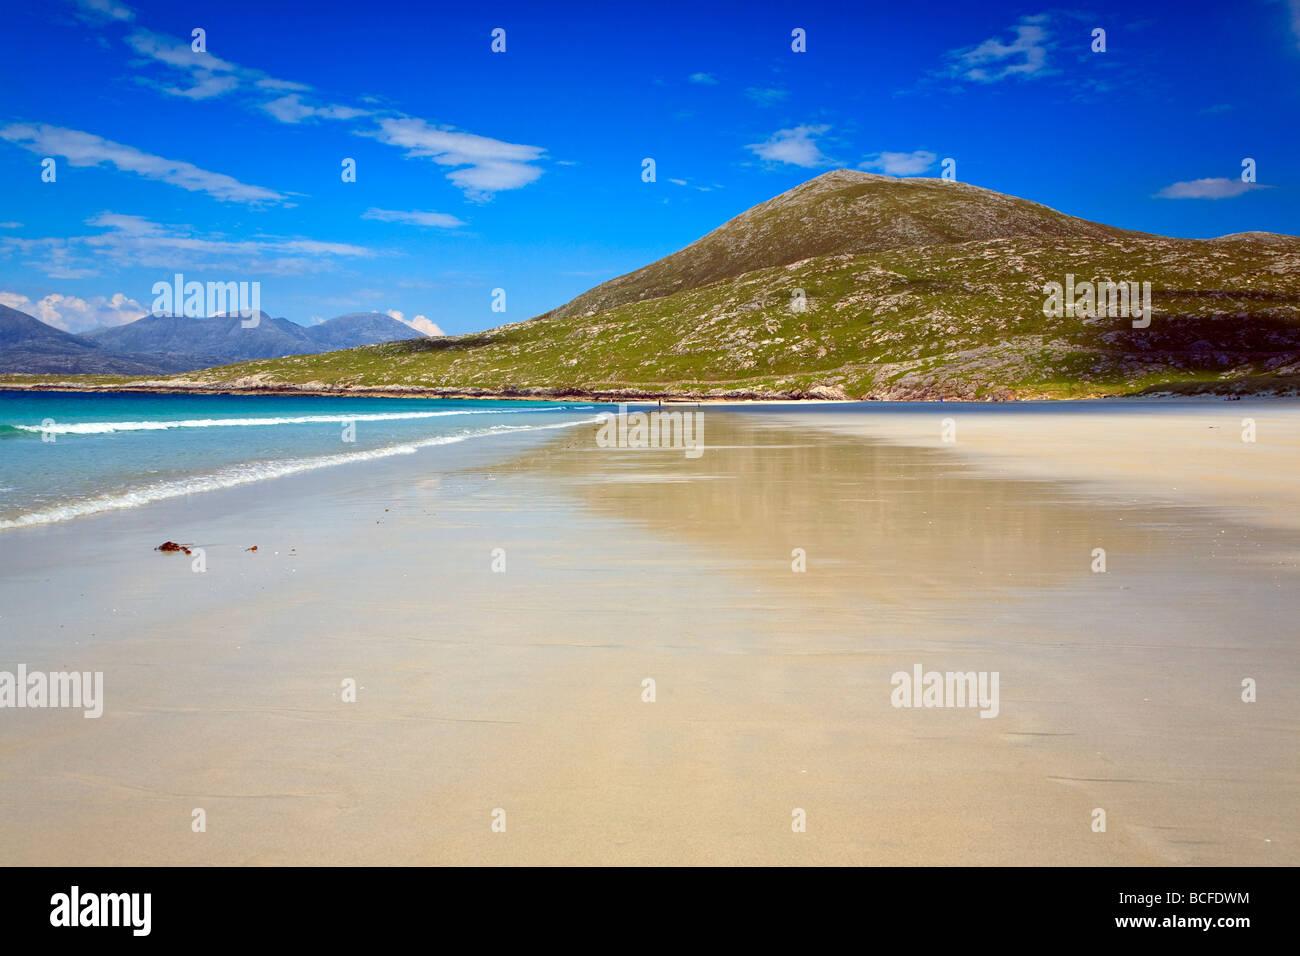 Sandy beach near Luskentyre Isle of Harris, Outer Hebrides, western isles, Scotland, UK 2009 - Stock Image